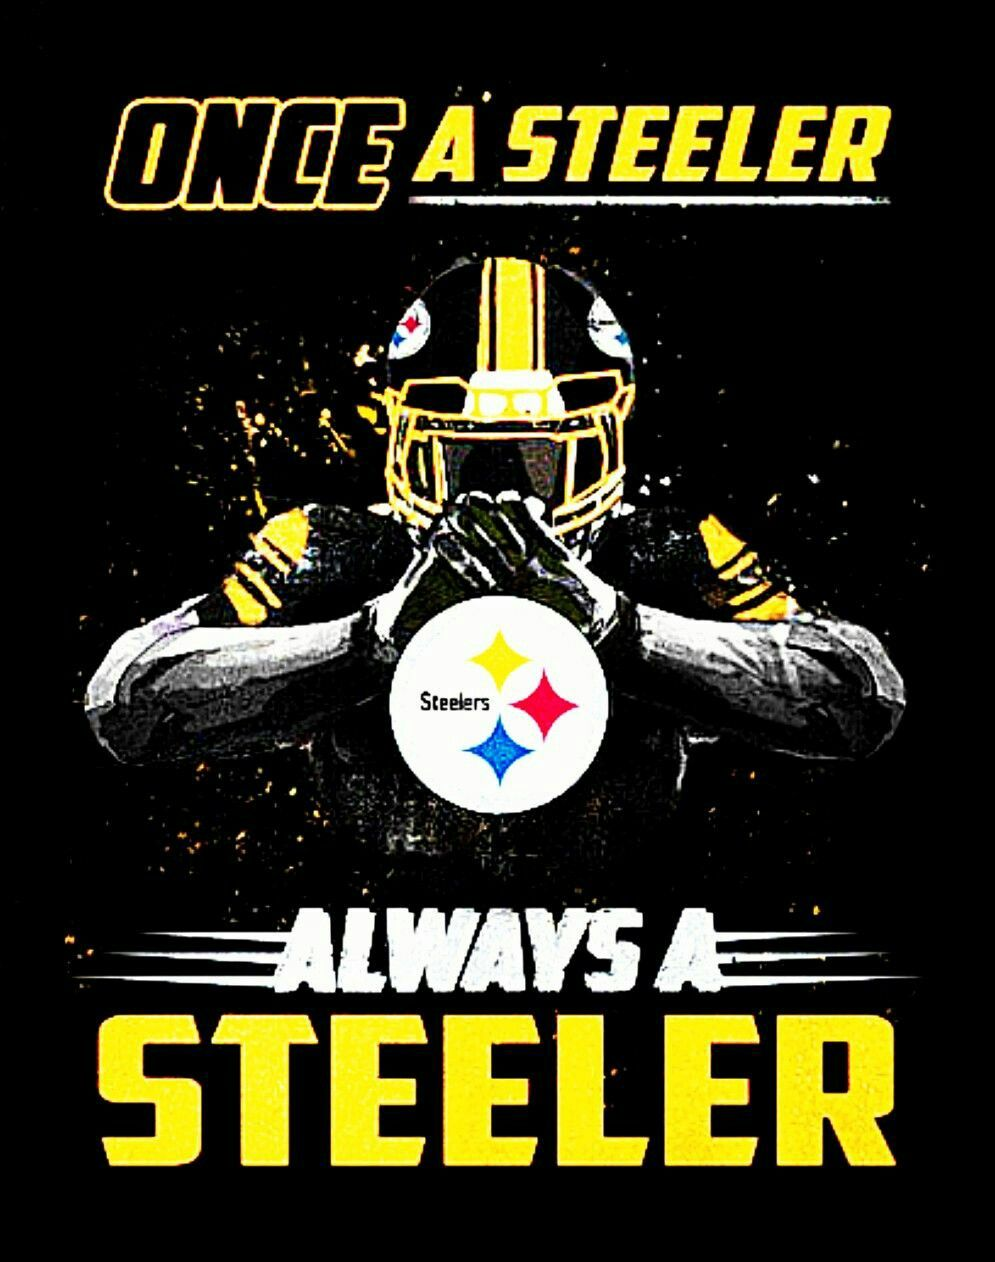 Steelers, Pittsburgh steelers, Pittsburgh steelers wallpaper